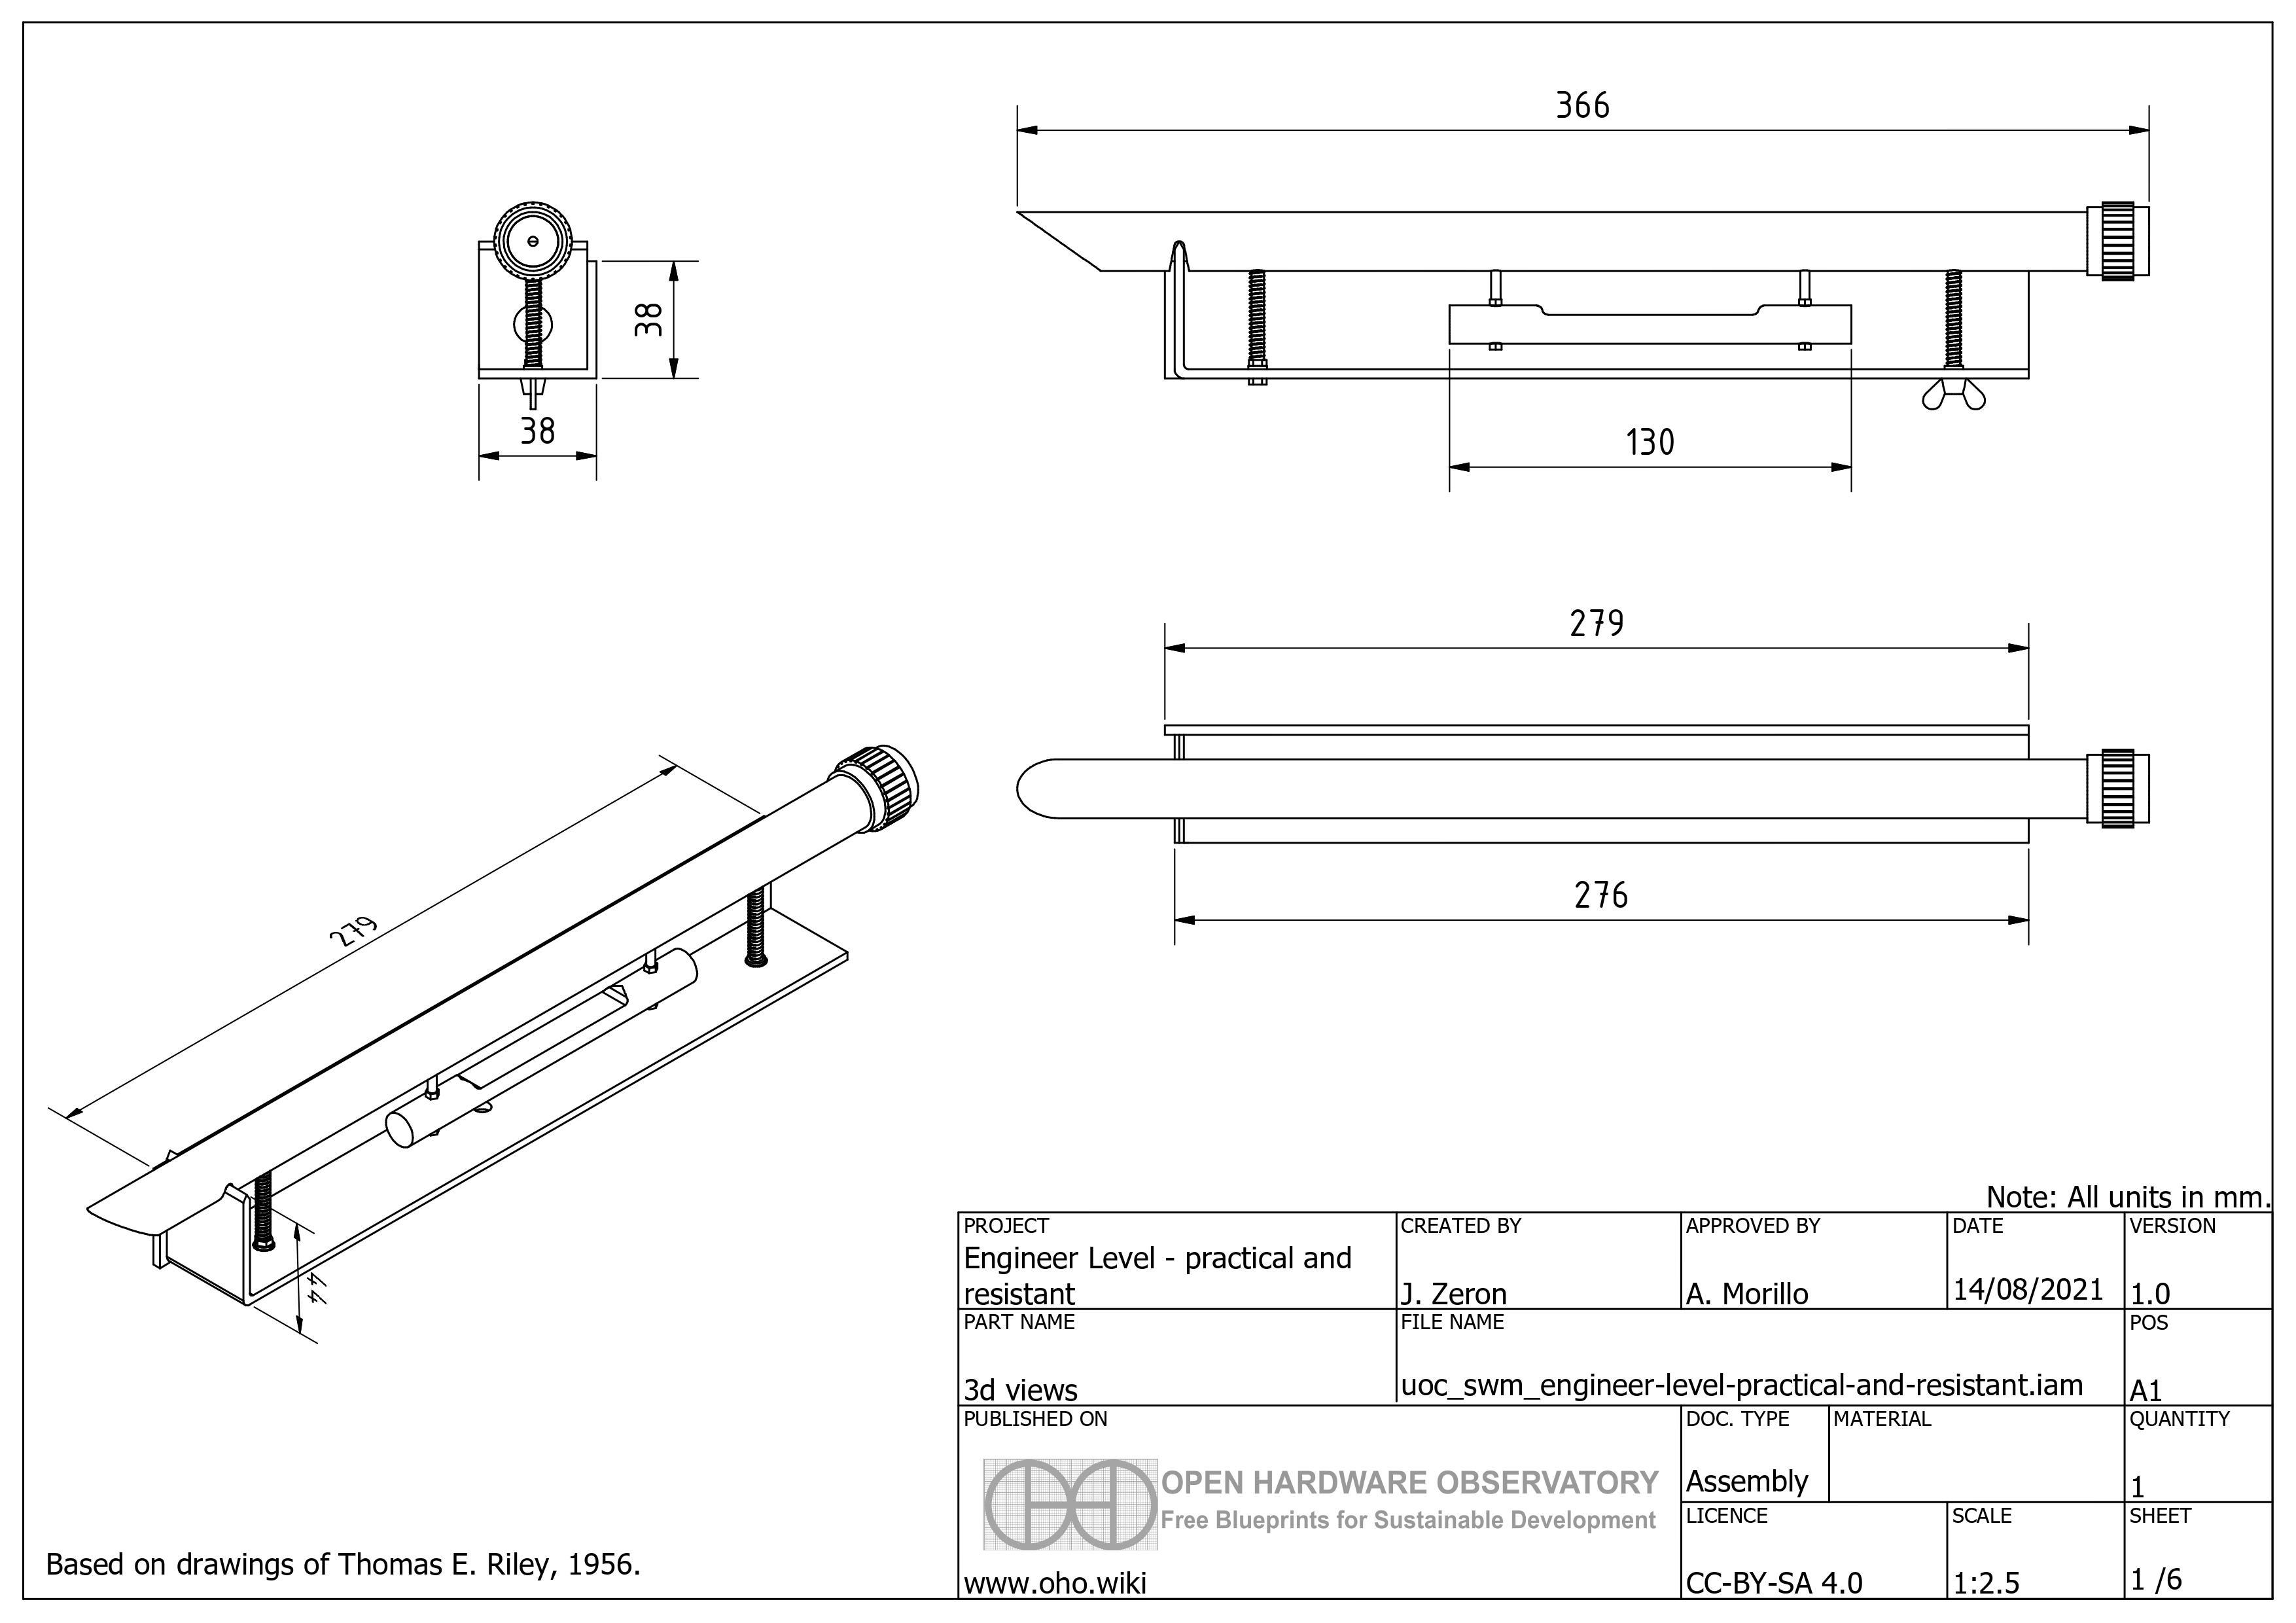 Uoc swm engineer-level-practical-and-resistant 0001.jpg